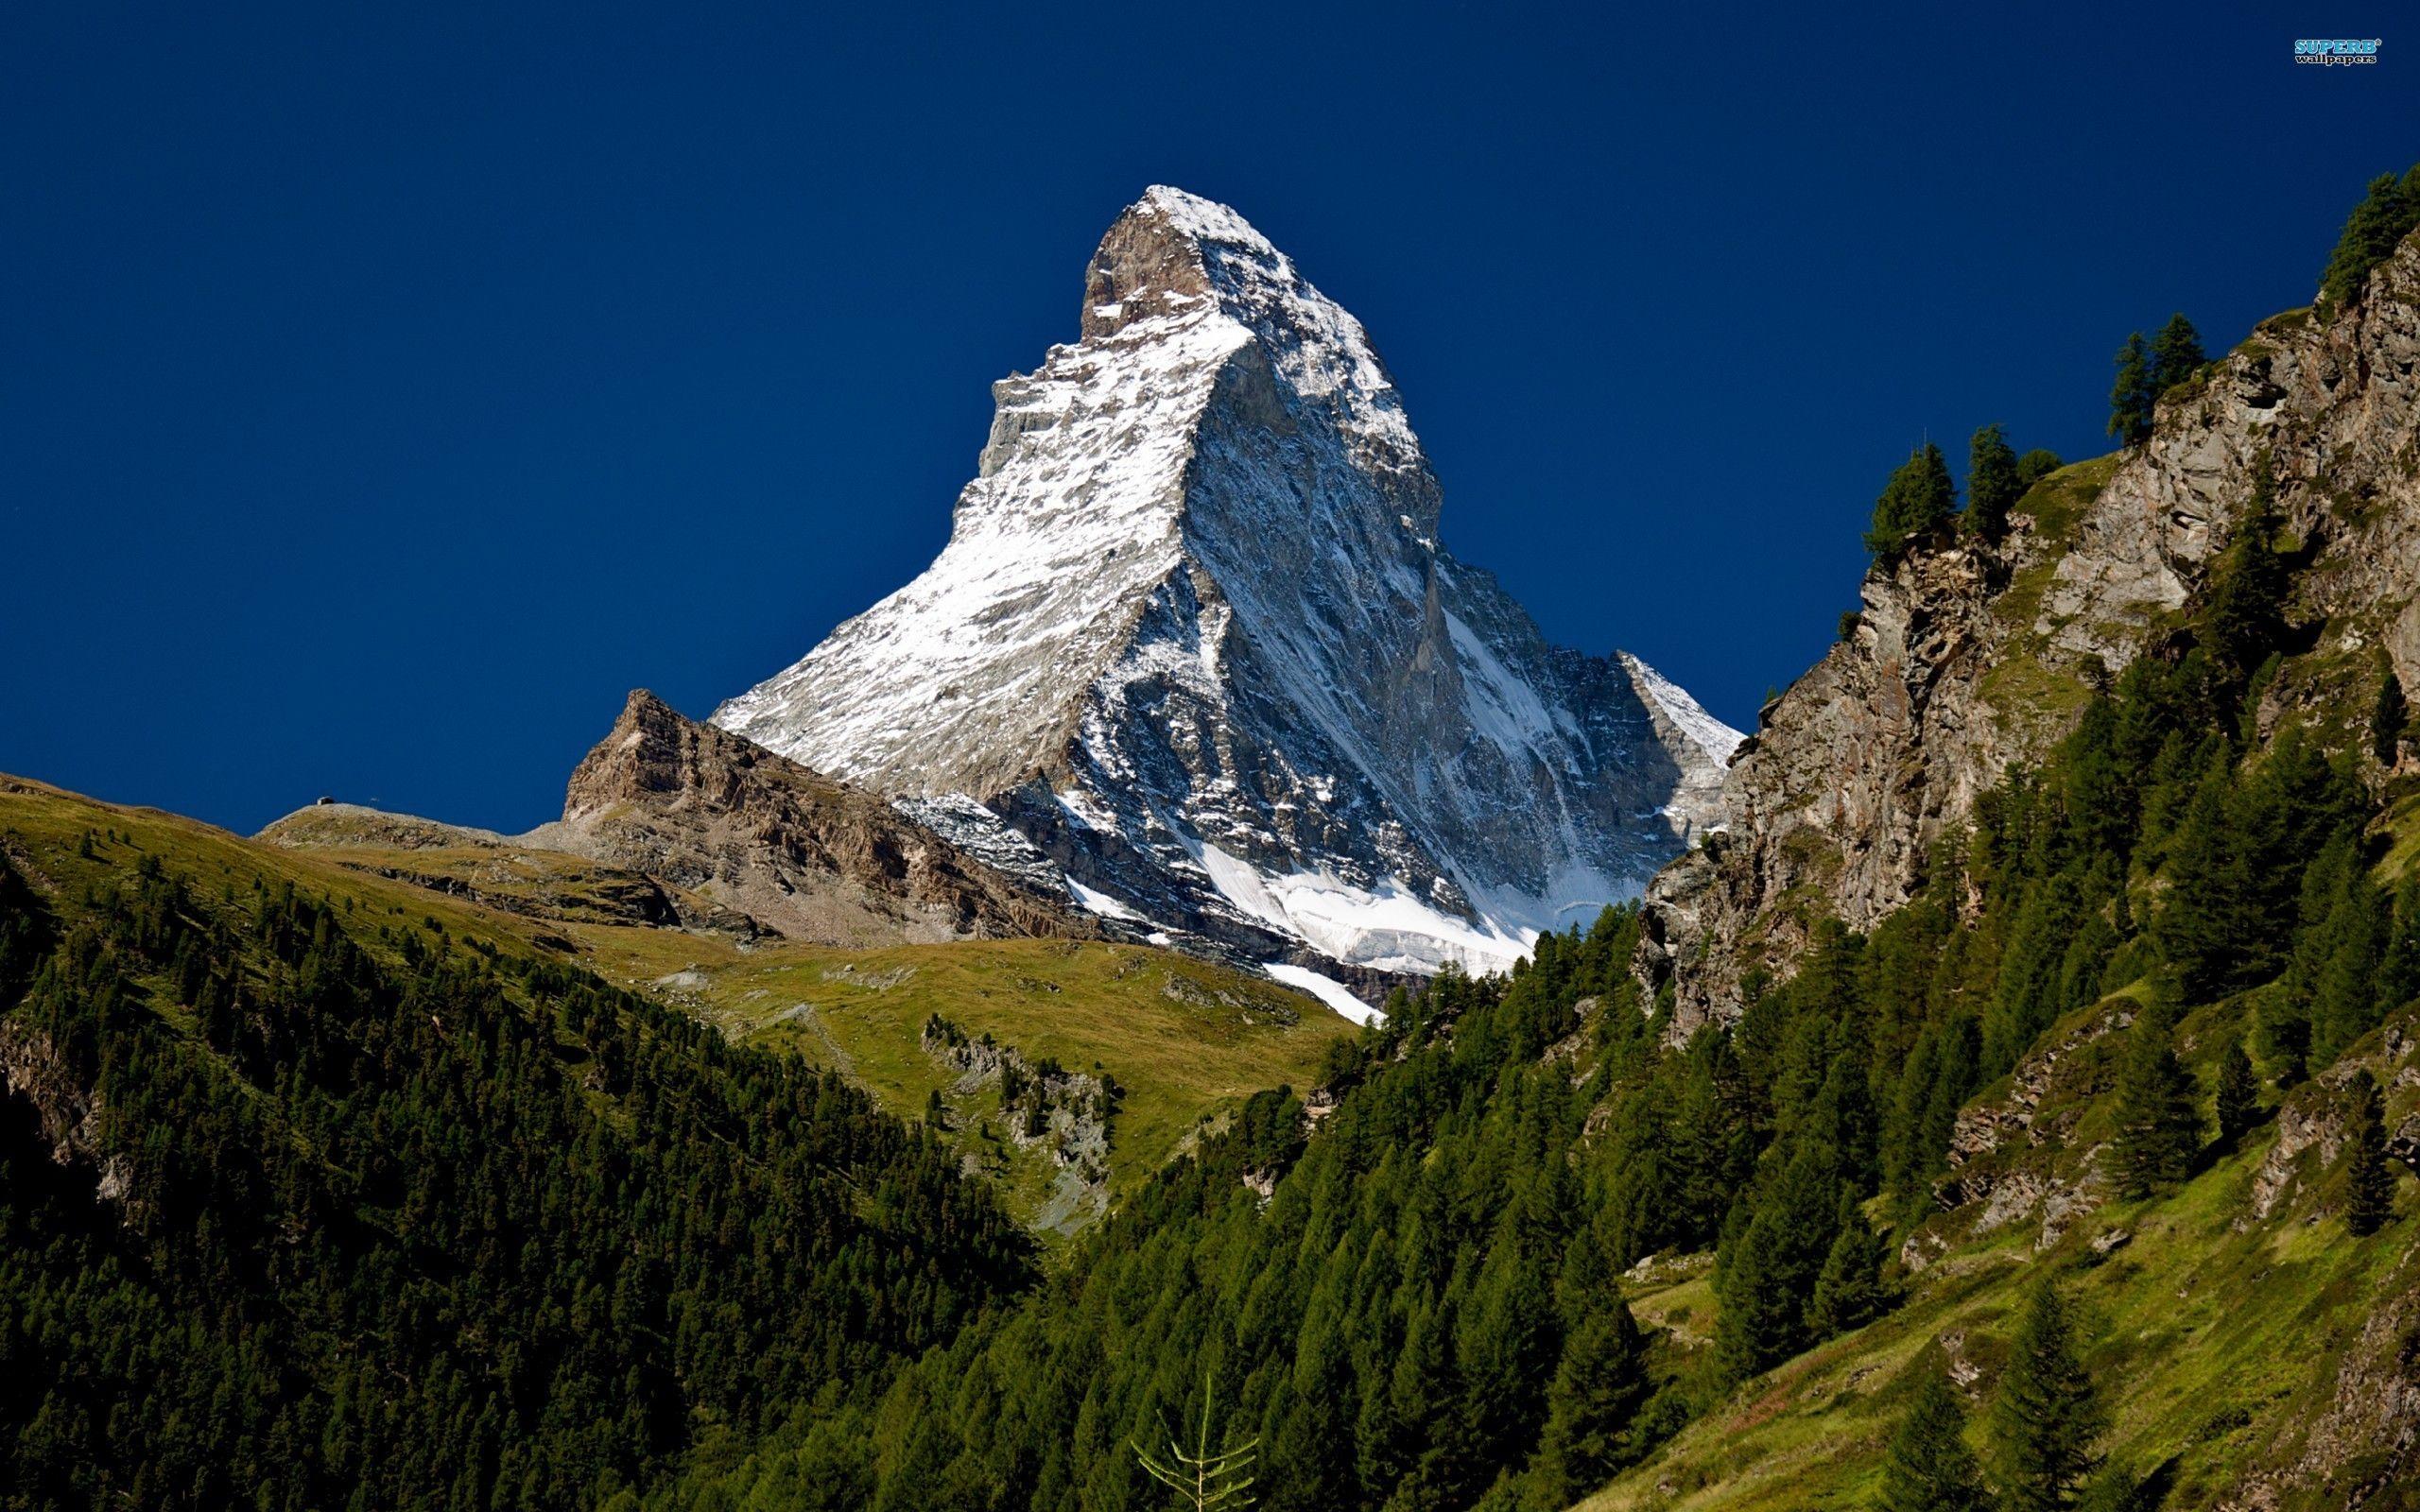 Matterhorn Mountain 2560 1600 Hd Landscape Landscape